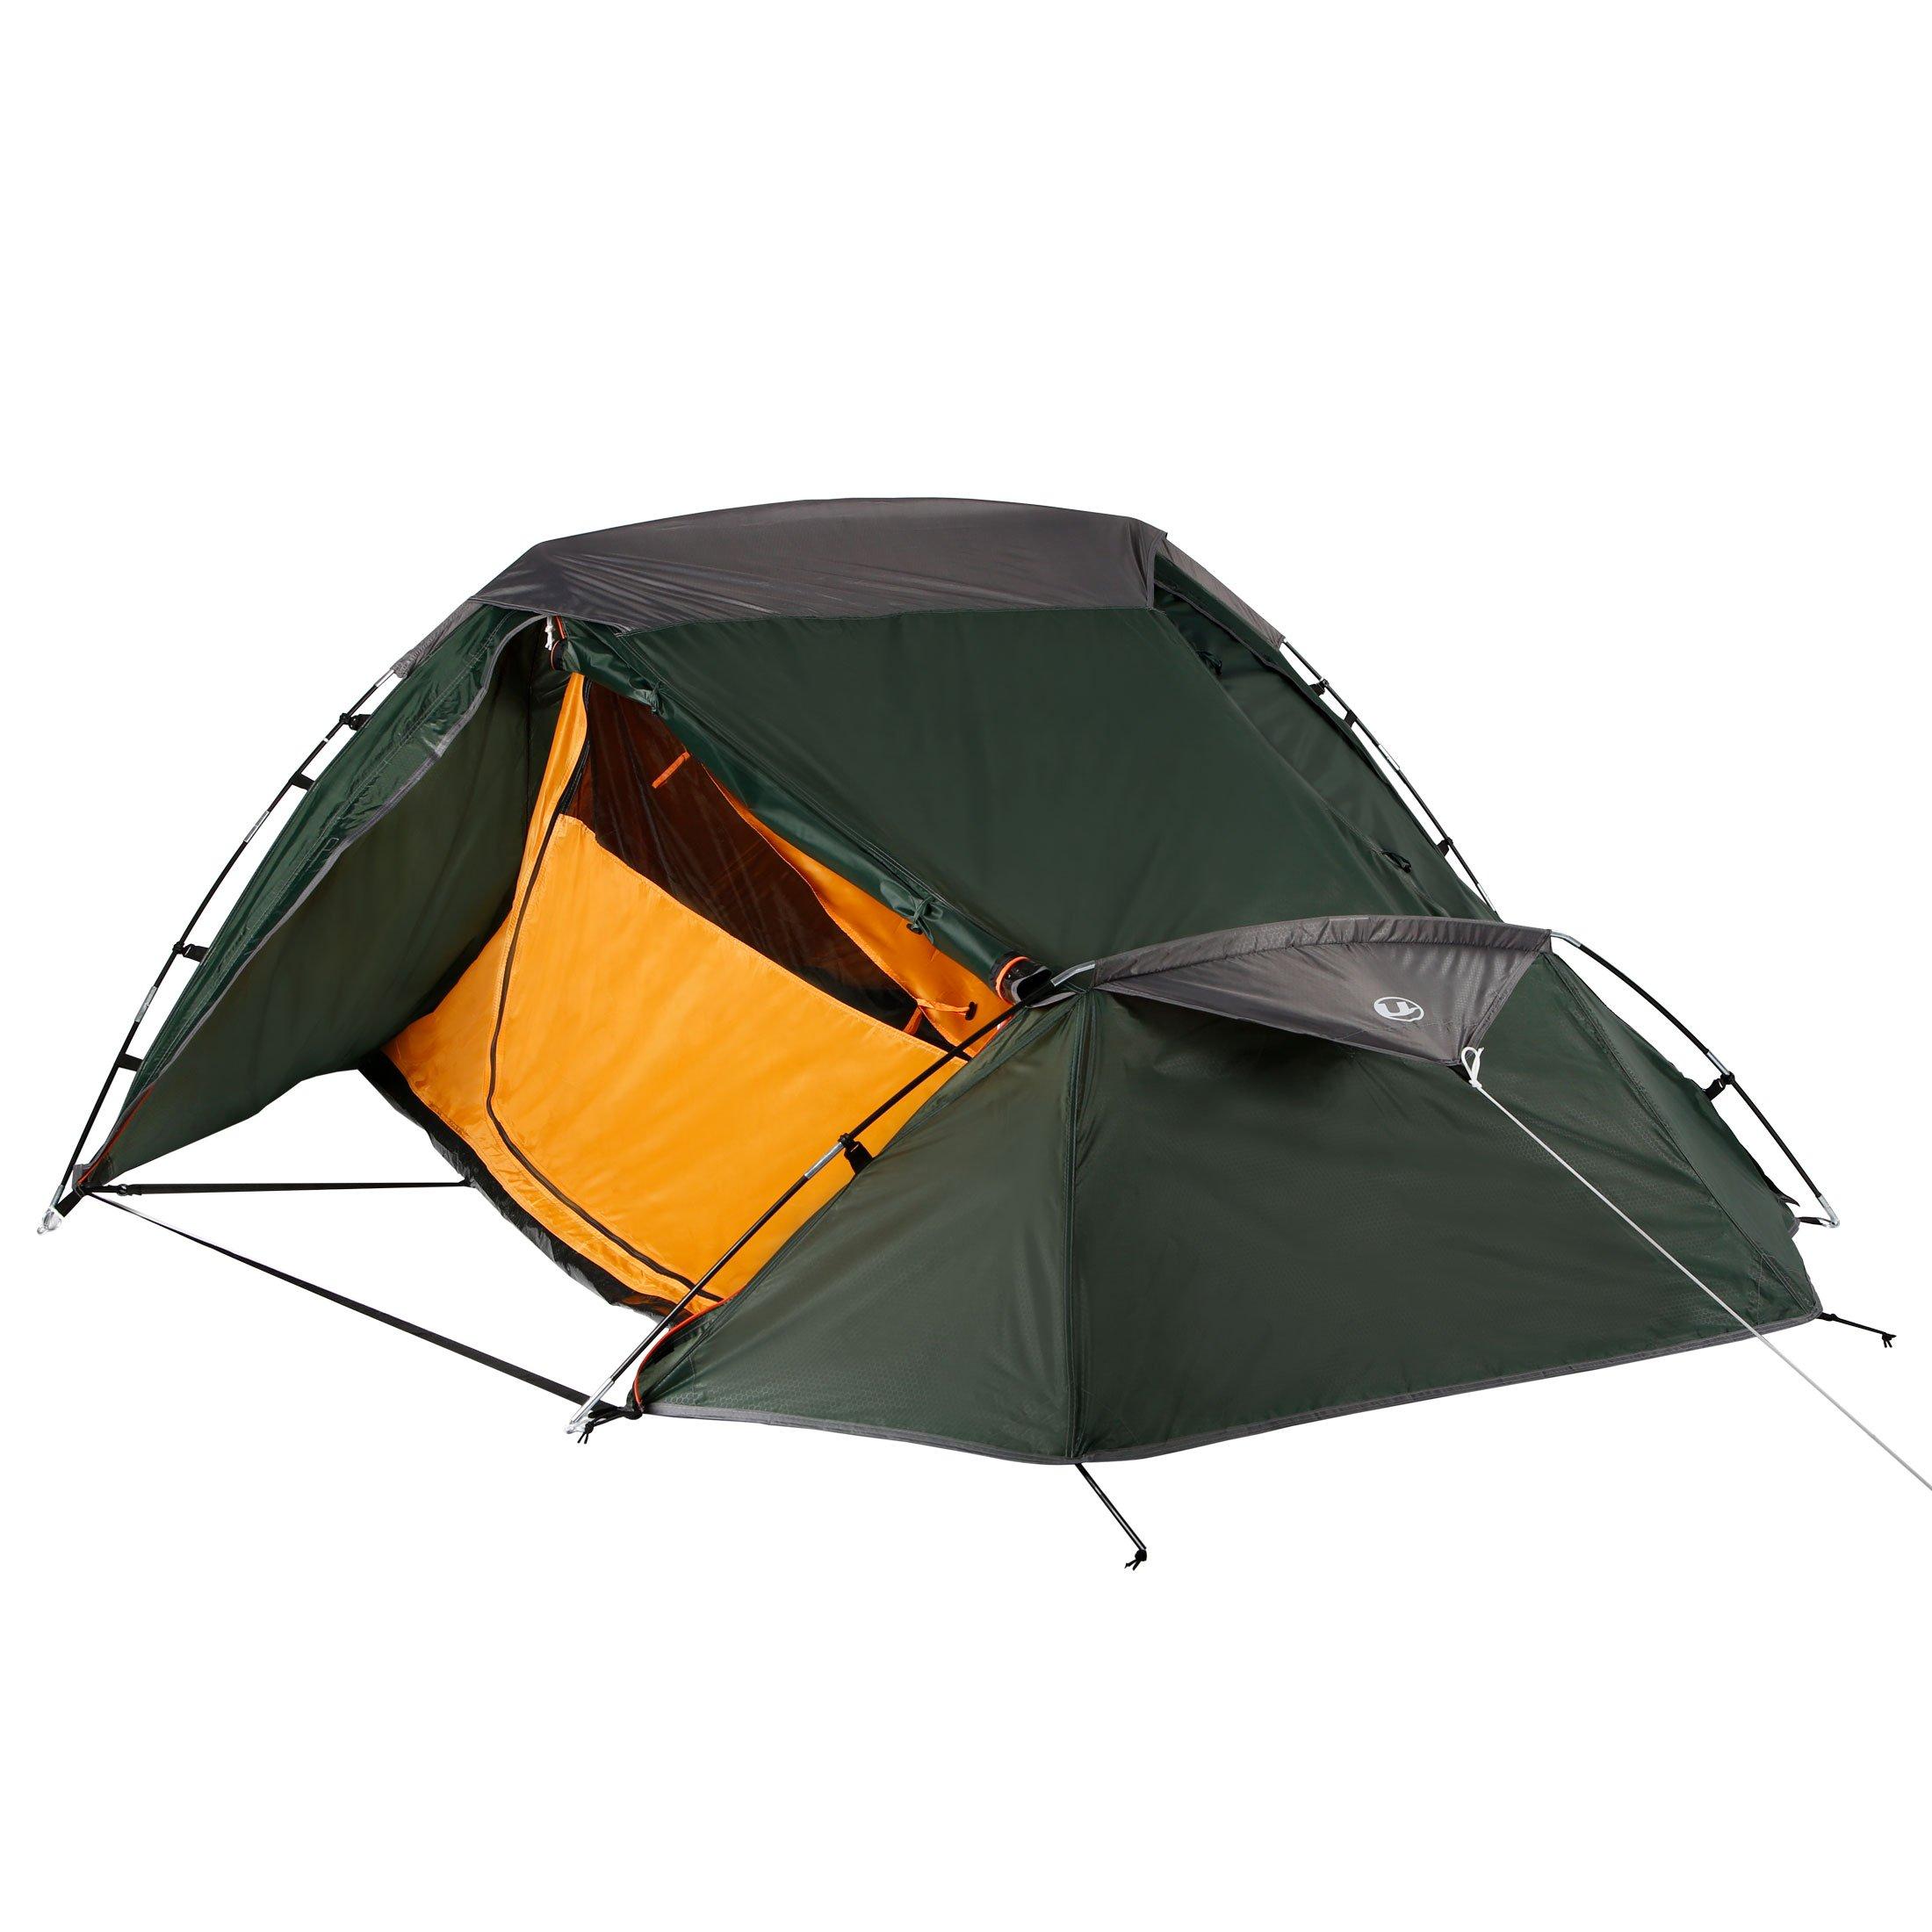 Ultrasport Trekking tienda, color verde/naranja, tamaño 2 personas product image